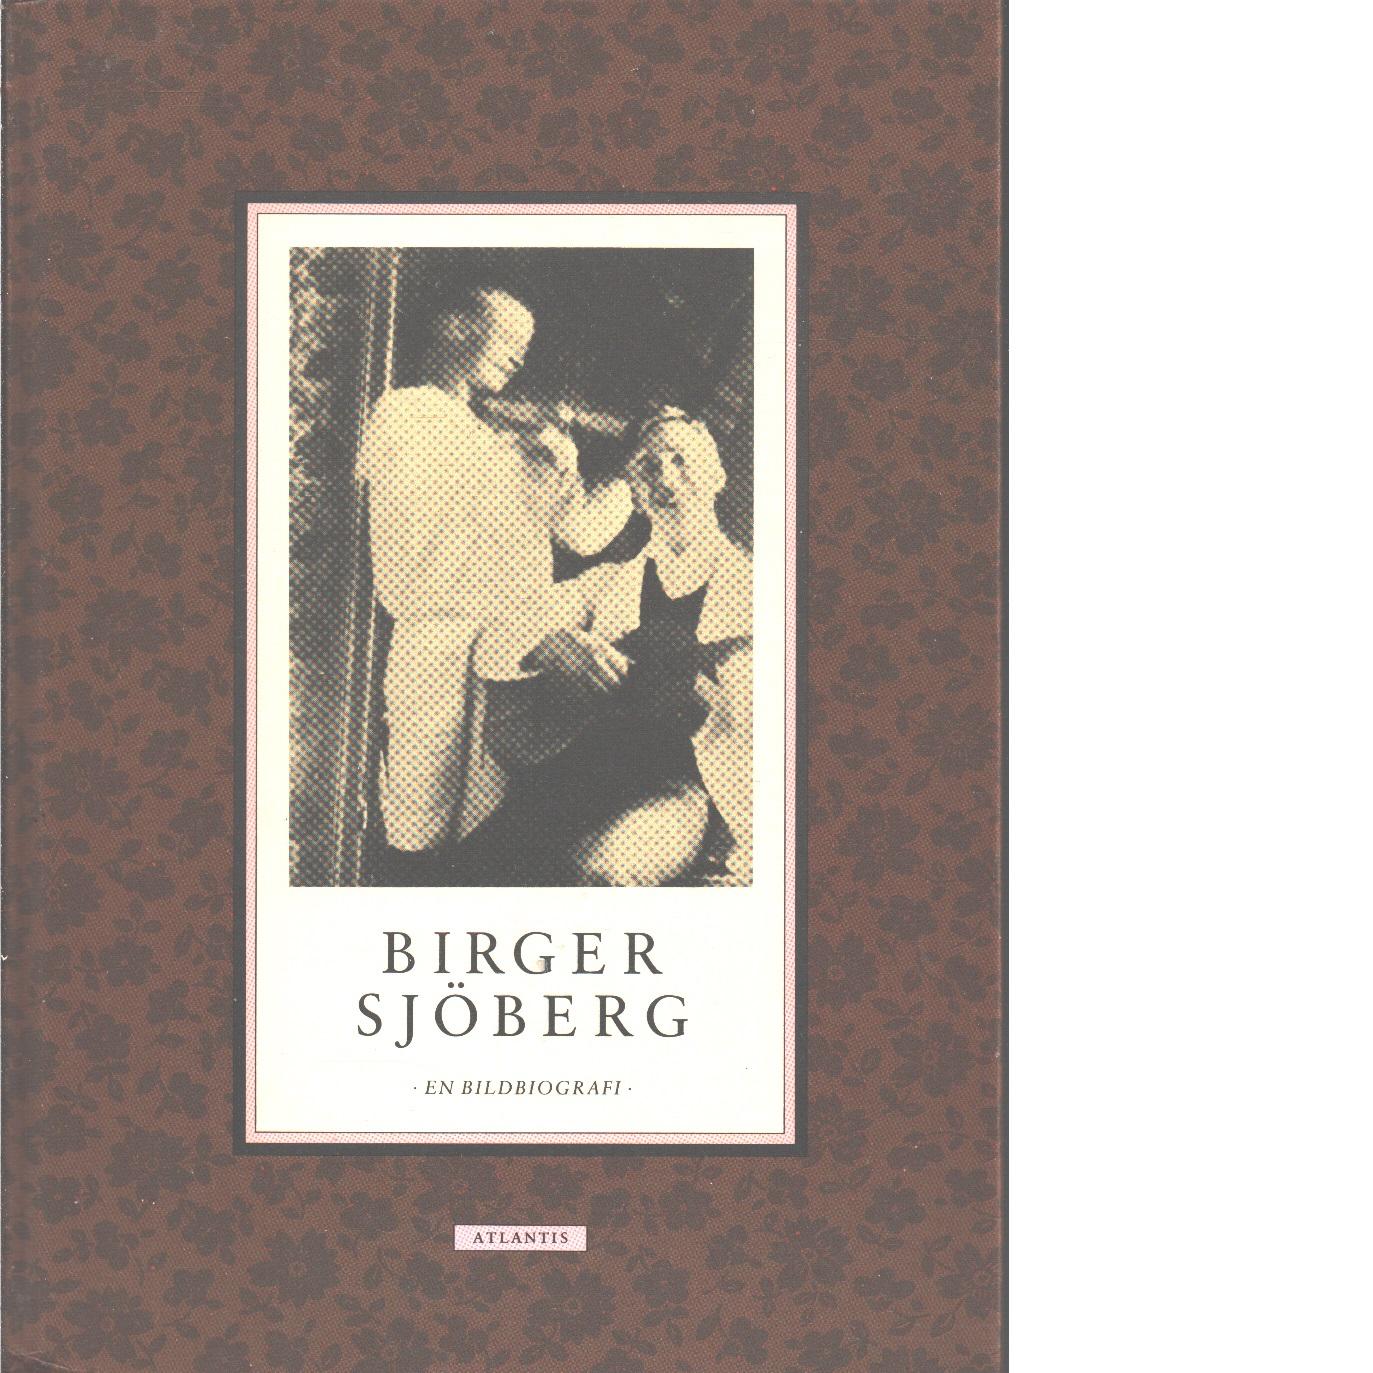 Birger Sjöberg : en bildbiografi - Tunving, Lars Helge och Wizelius, Ingemar